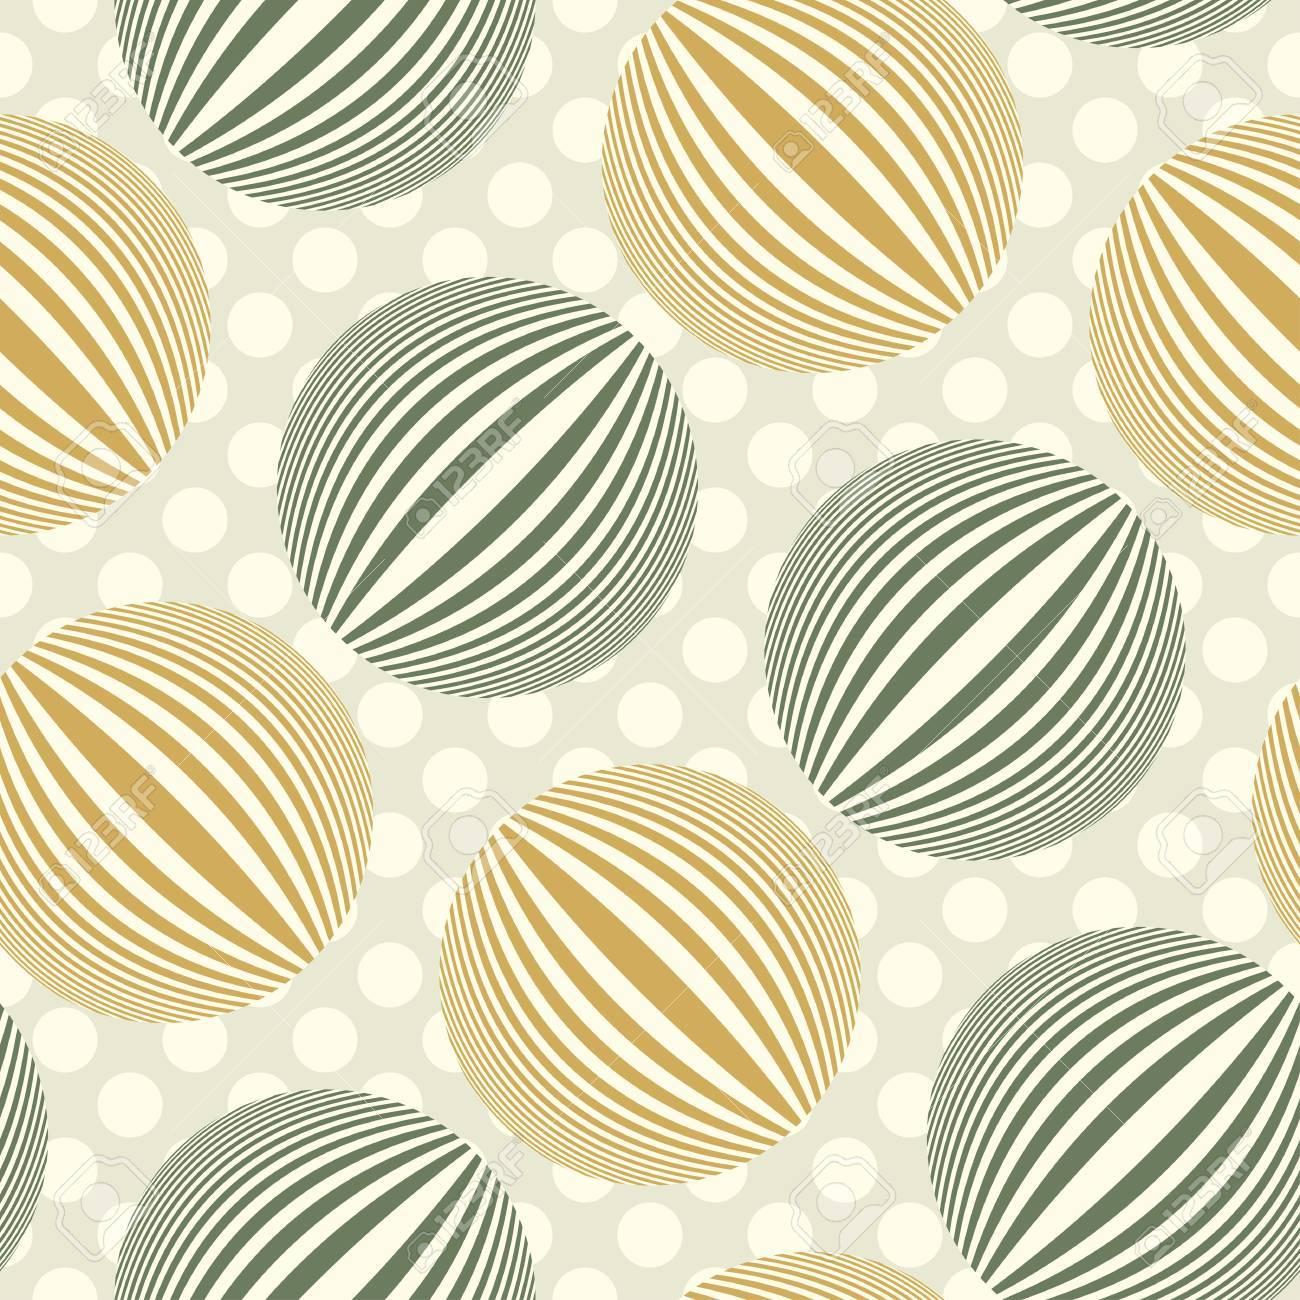 Striped bubbles polka dot  Seamless pattern  Vector Stock Vector - 19867713